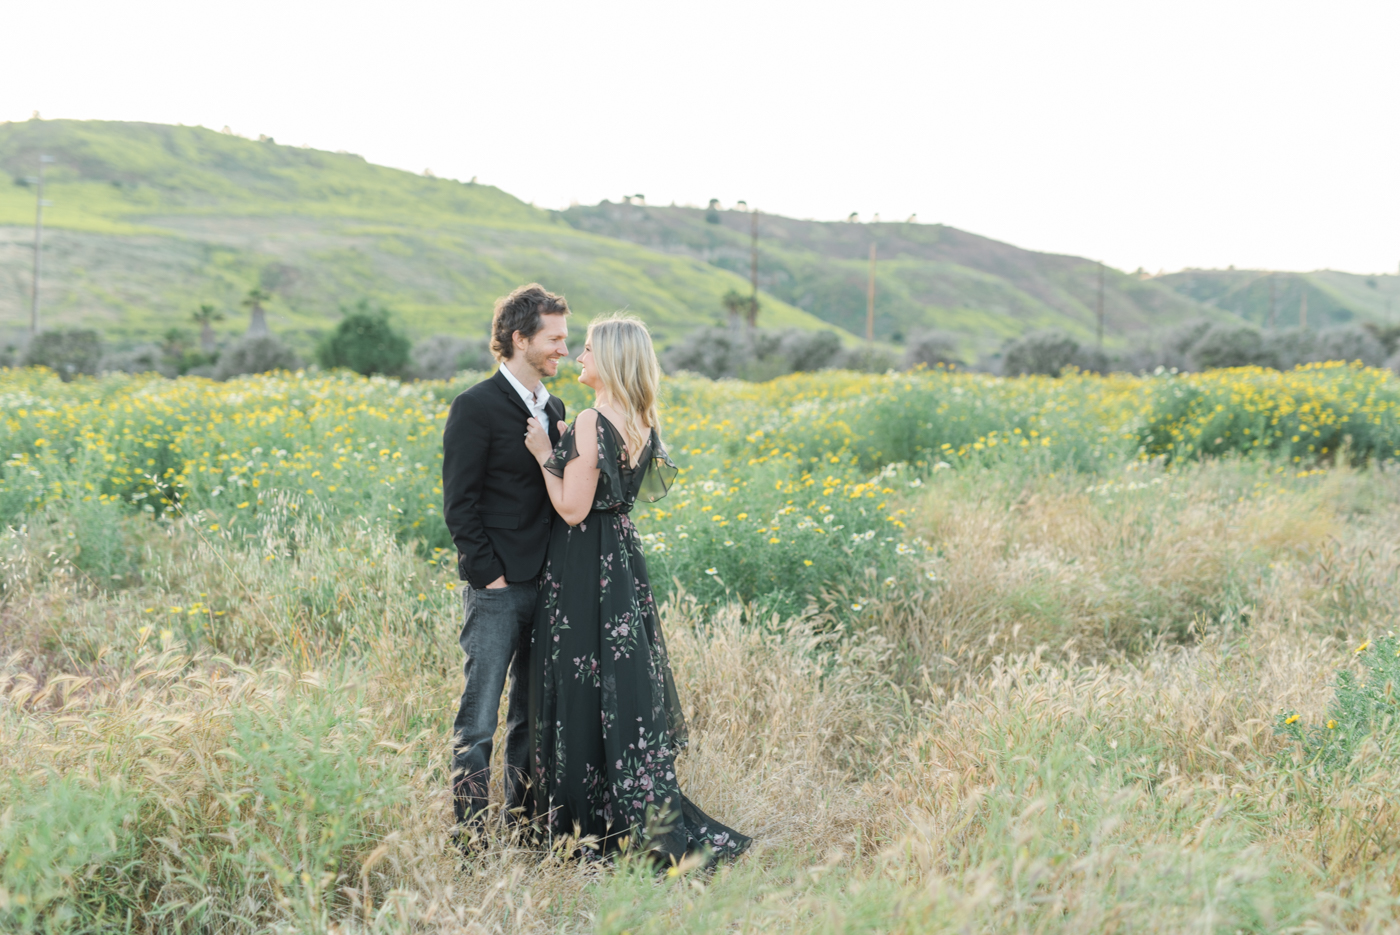 San_Juan_Capistrano_Goldendoodle_family_portrait_session_los_angeles_wedding_photographer-16.jpg